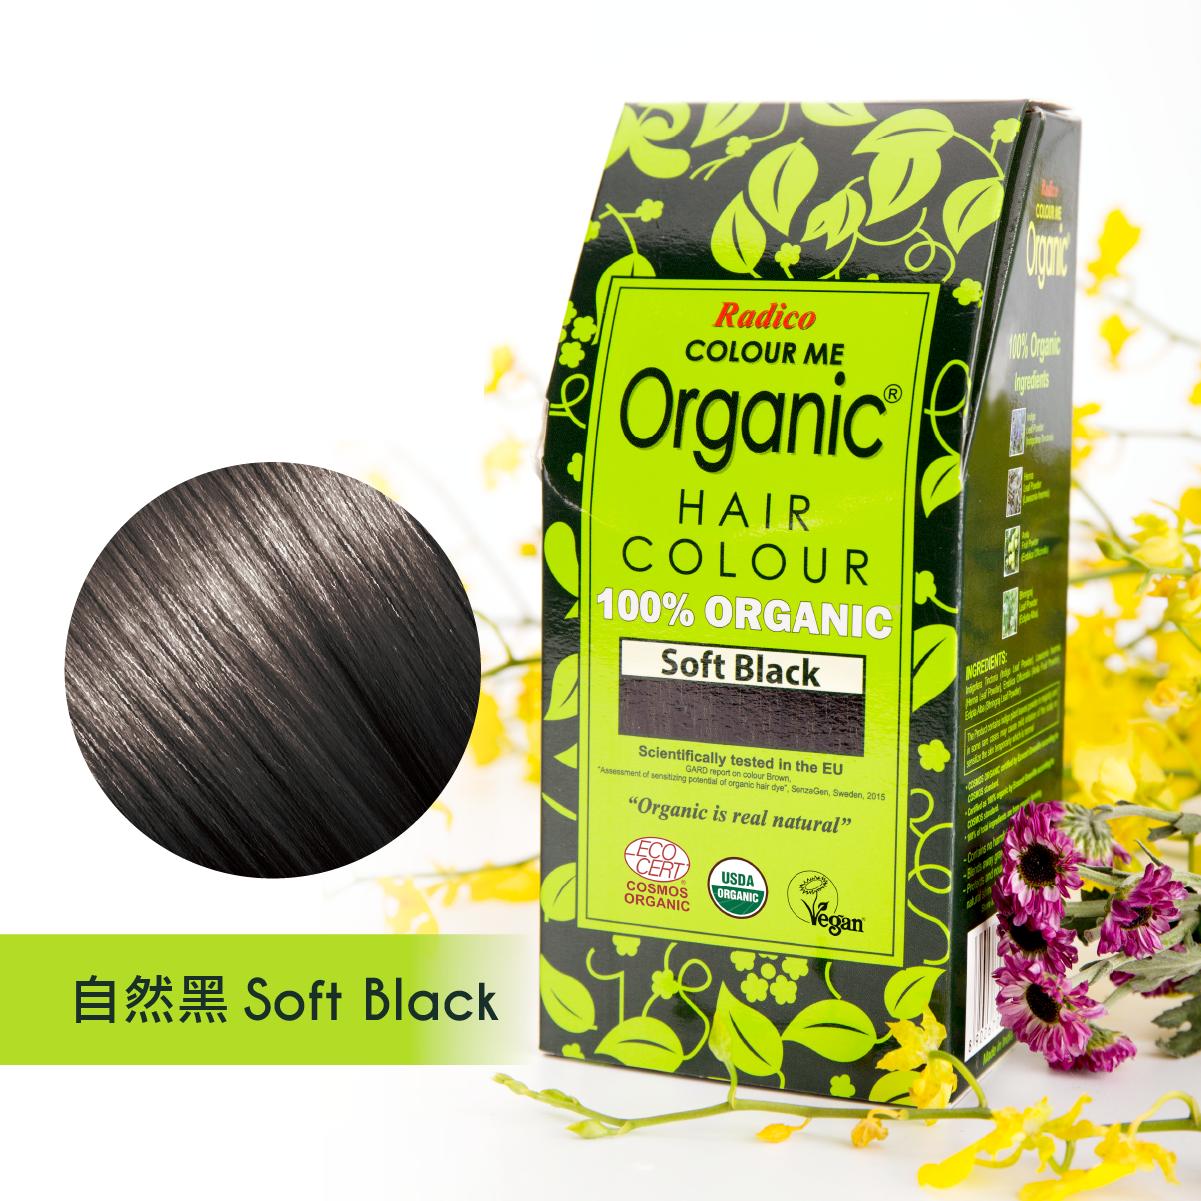 Radico Organic Hair Colour - Soft Black